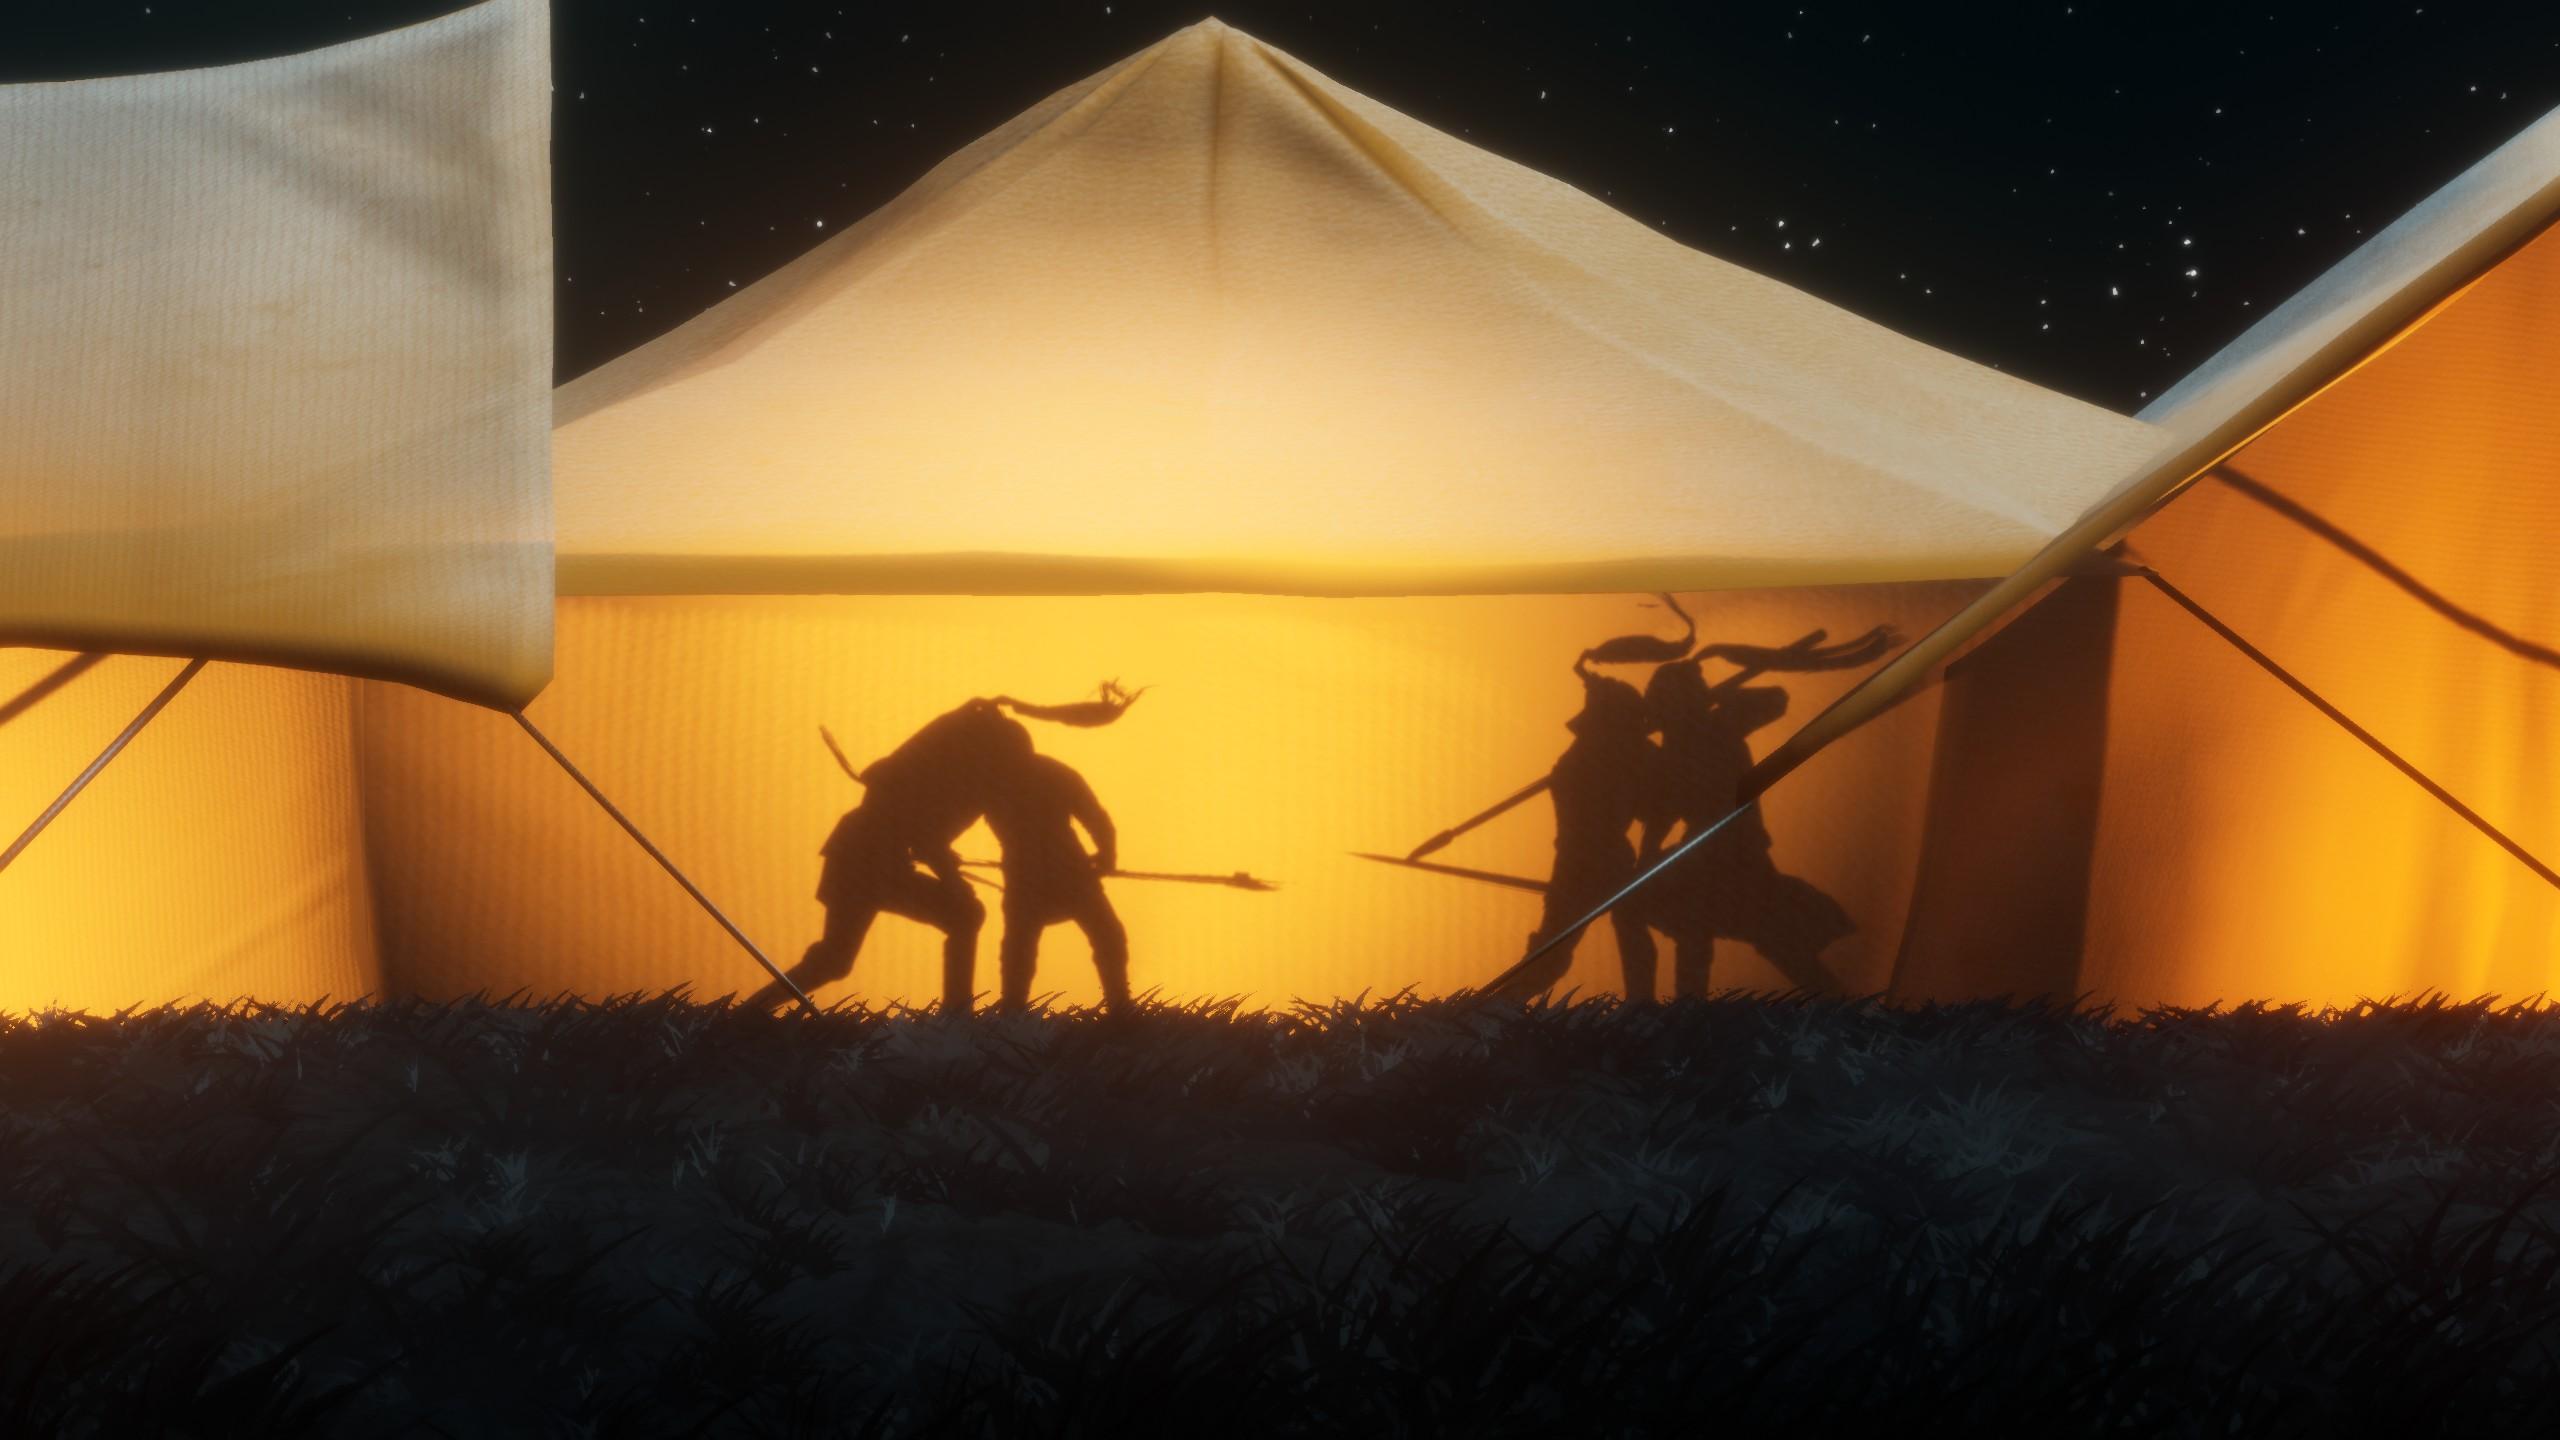 griefhelm campsite